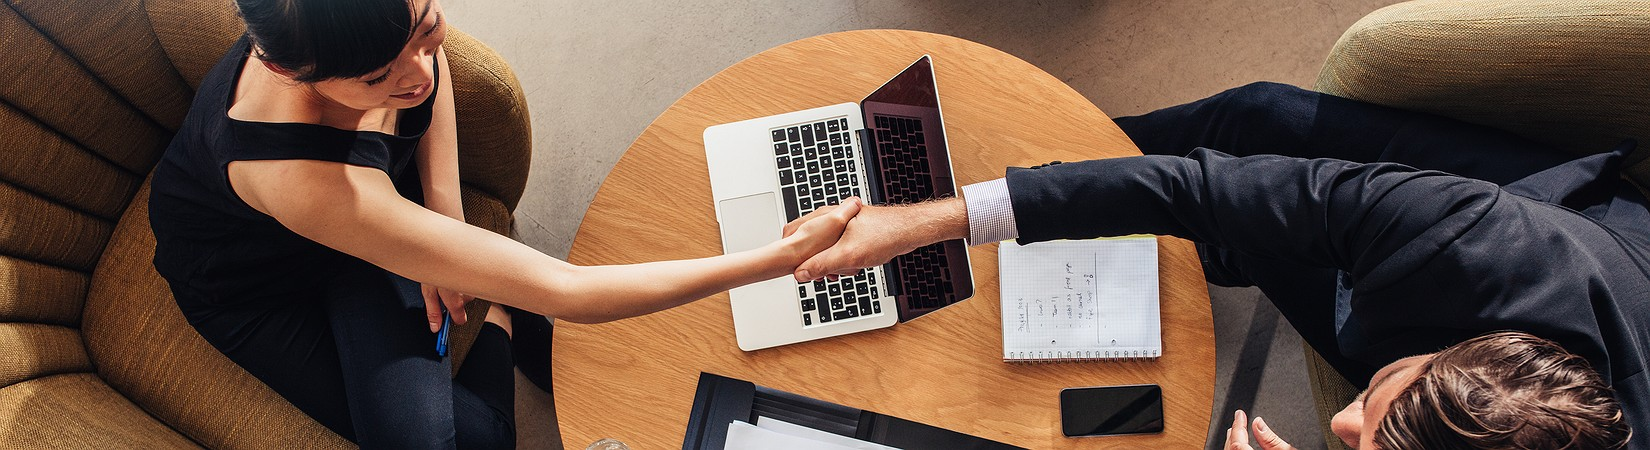 Cómo tu lenguaje corporal puede arruinar tu carrera profesional